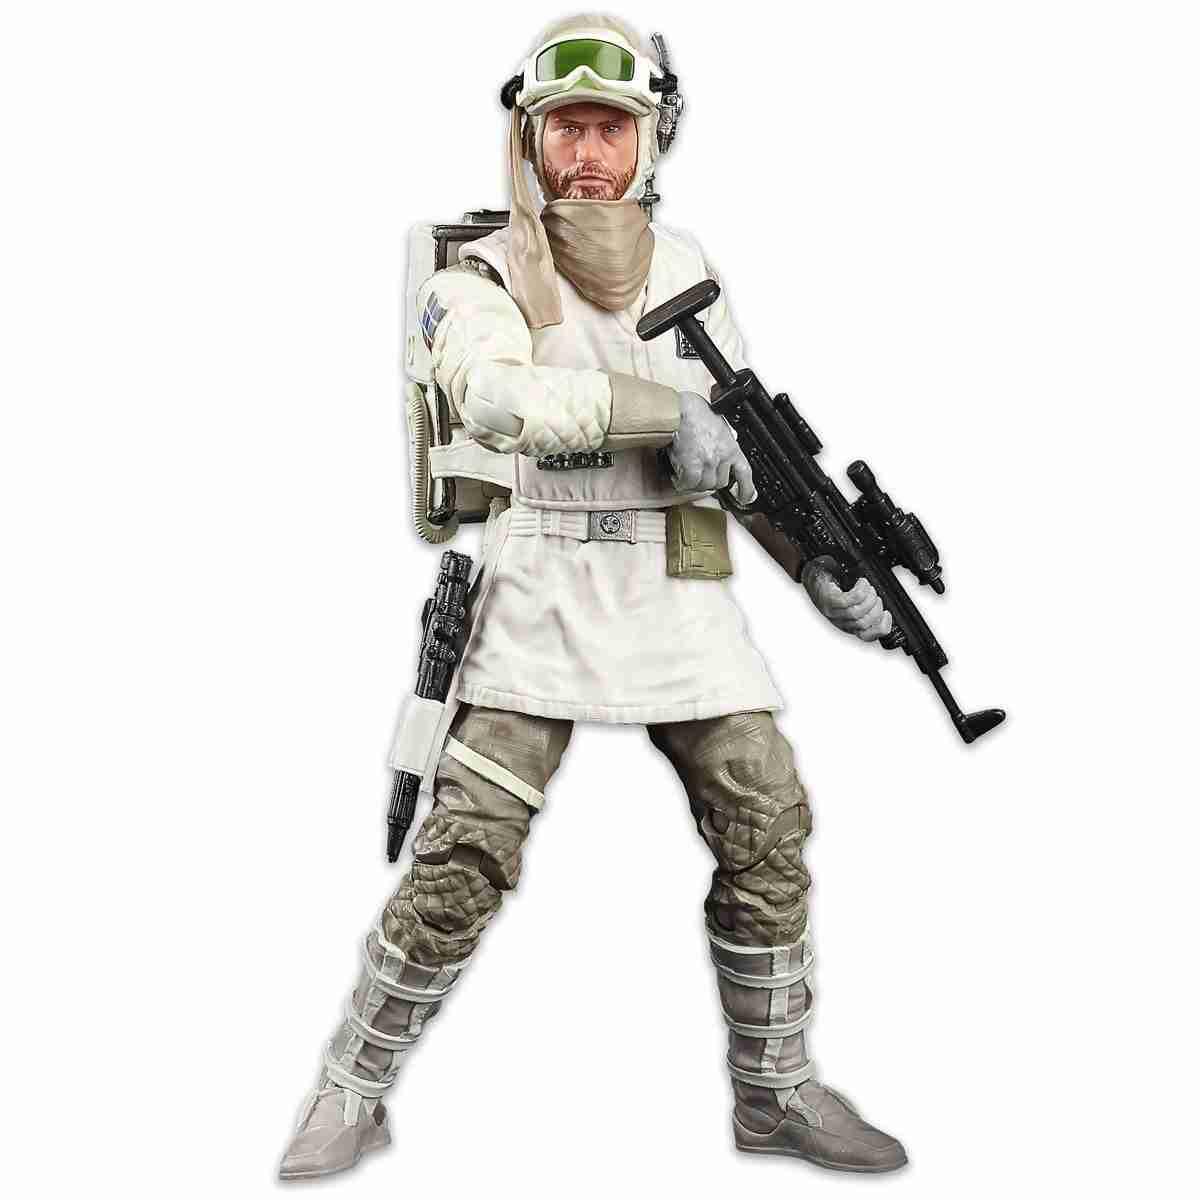 Rebel Soldier Hoth 1